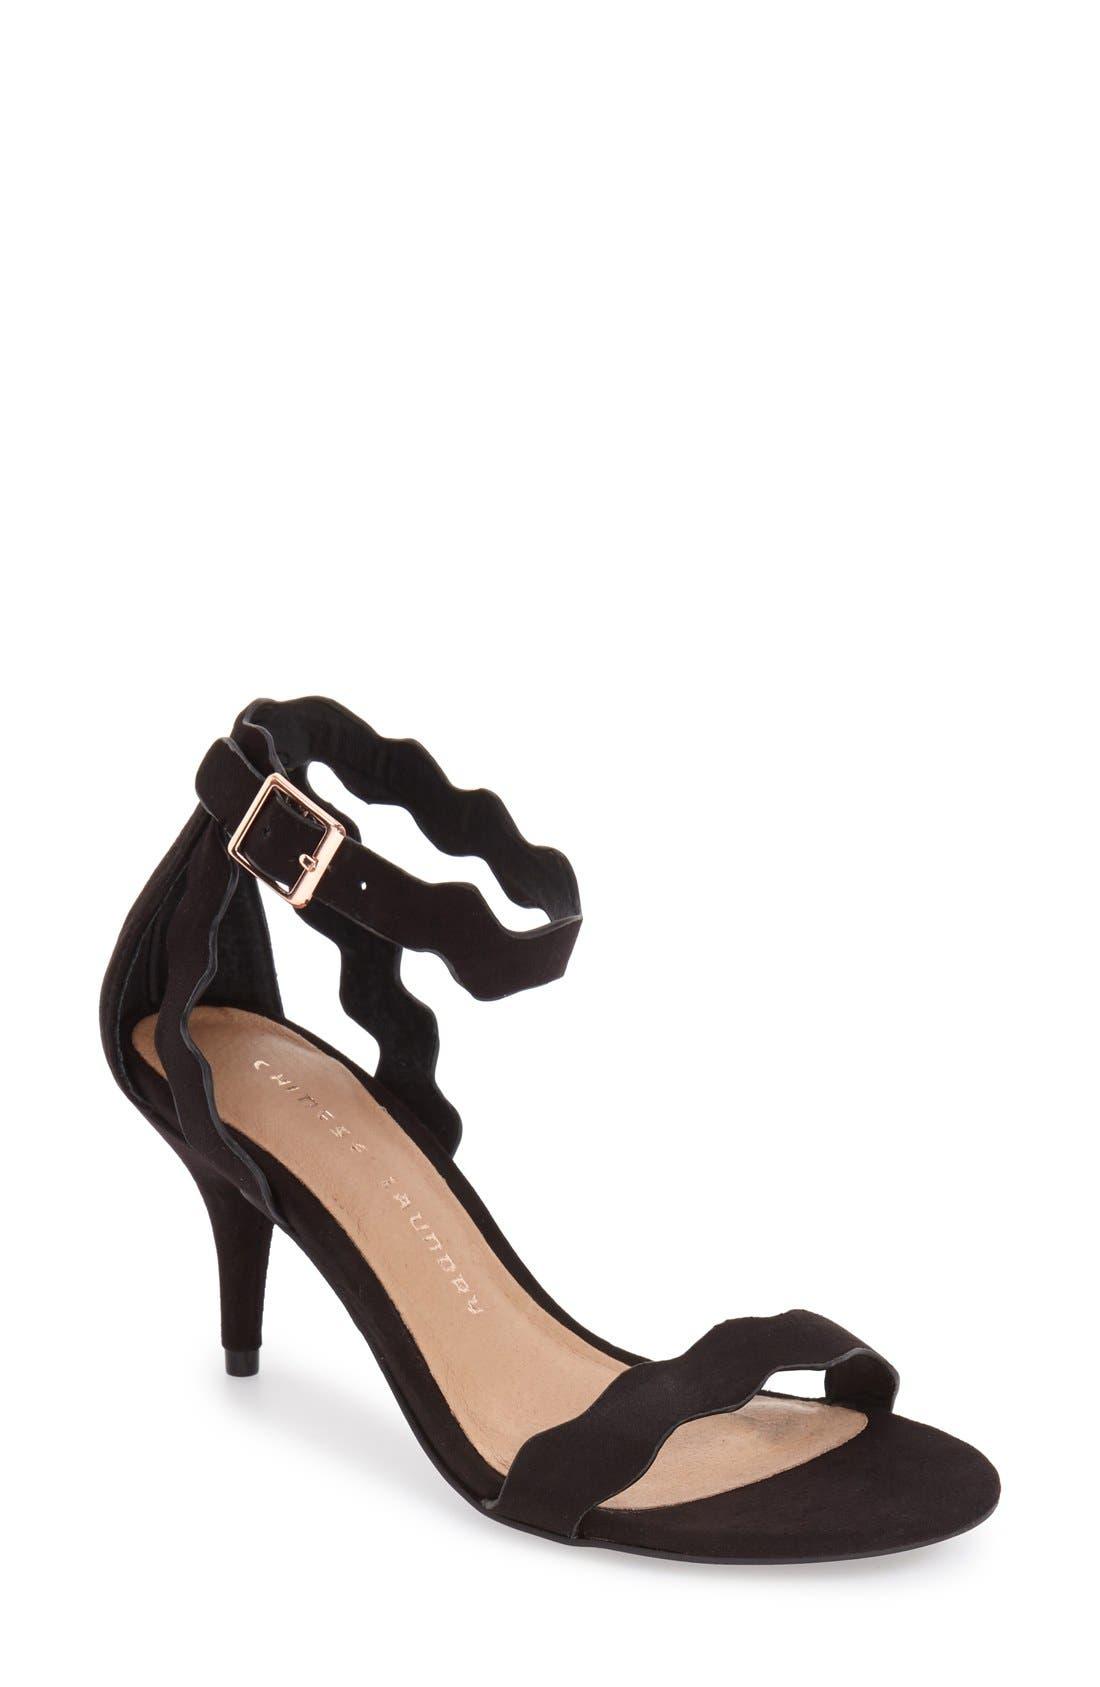 Main Image - Chinese Laundry 'Rubie' Scalloped Ankle Strap Sandal (Women)